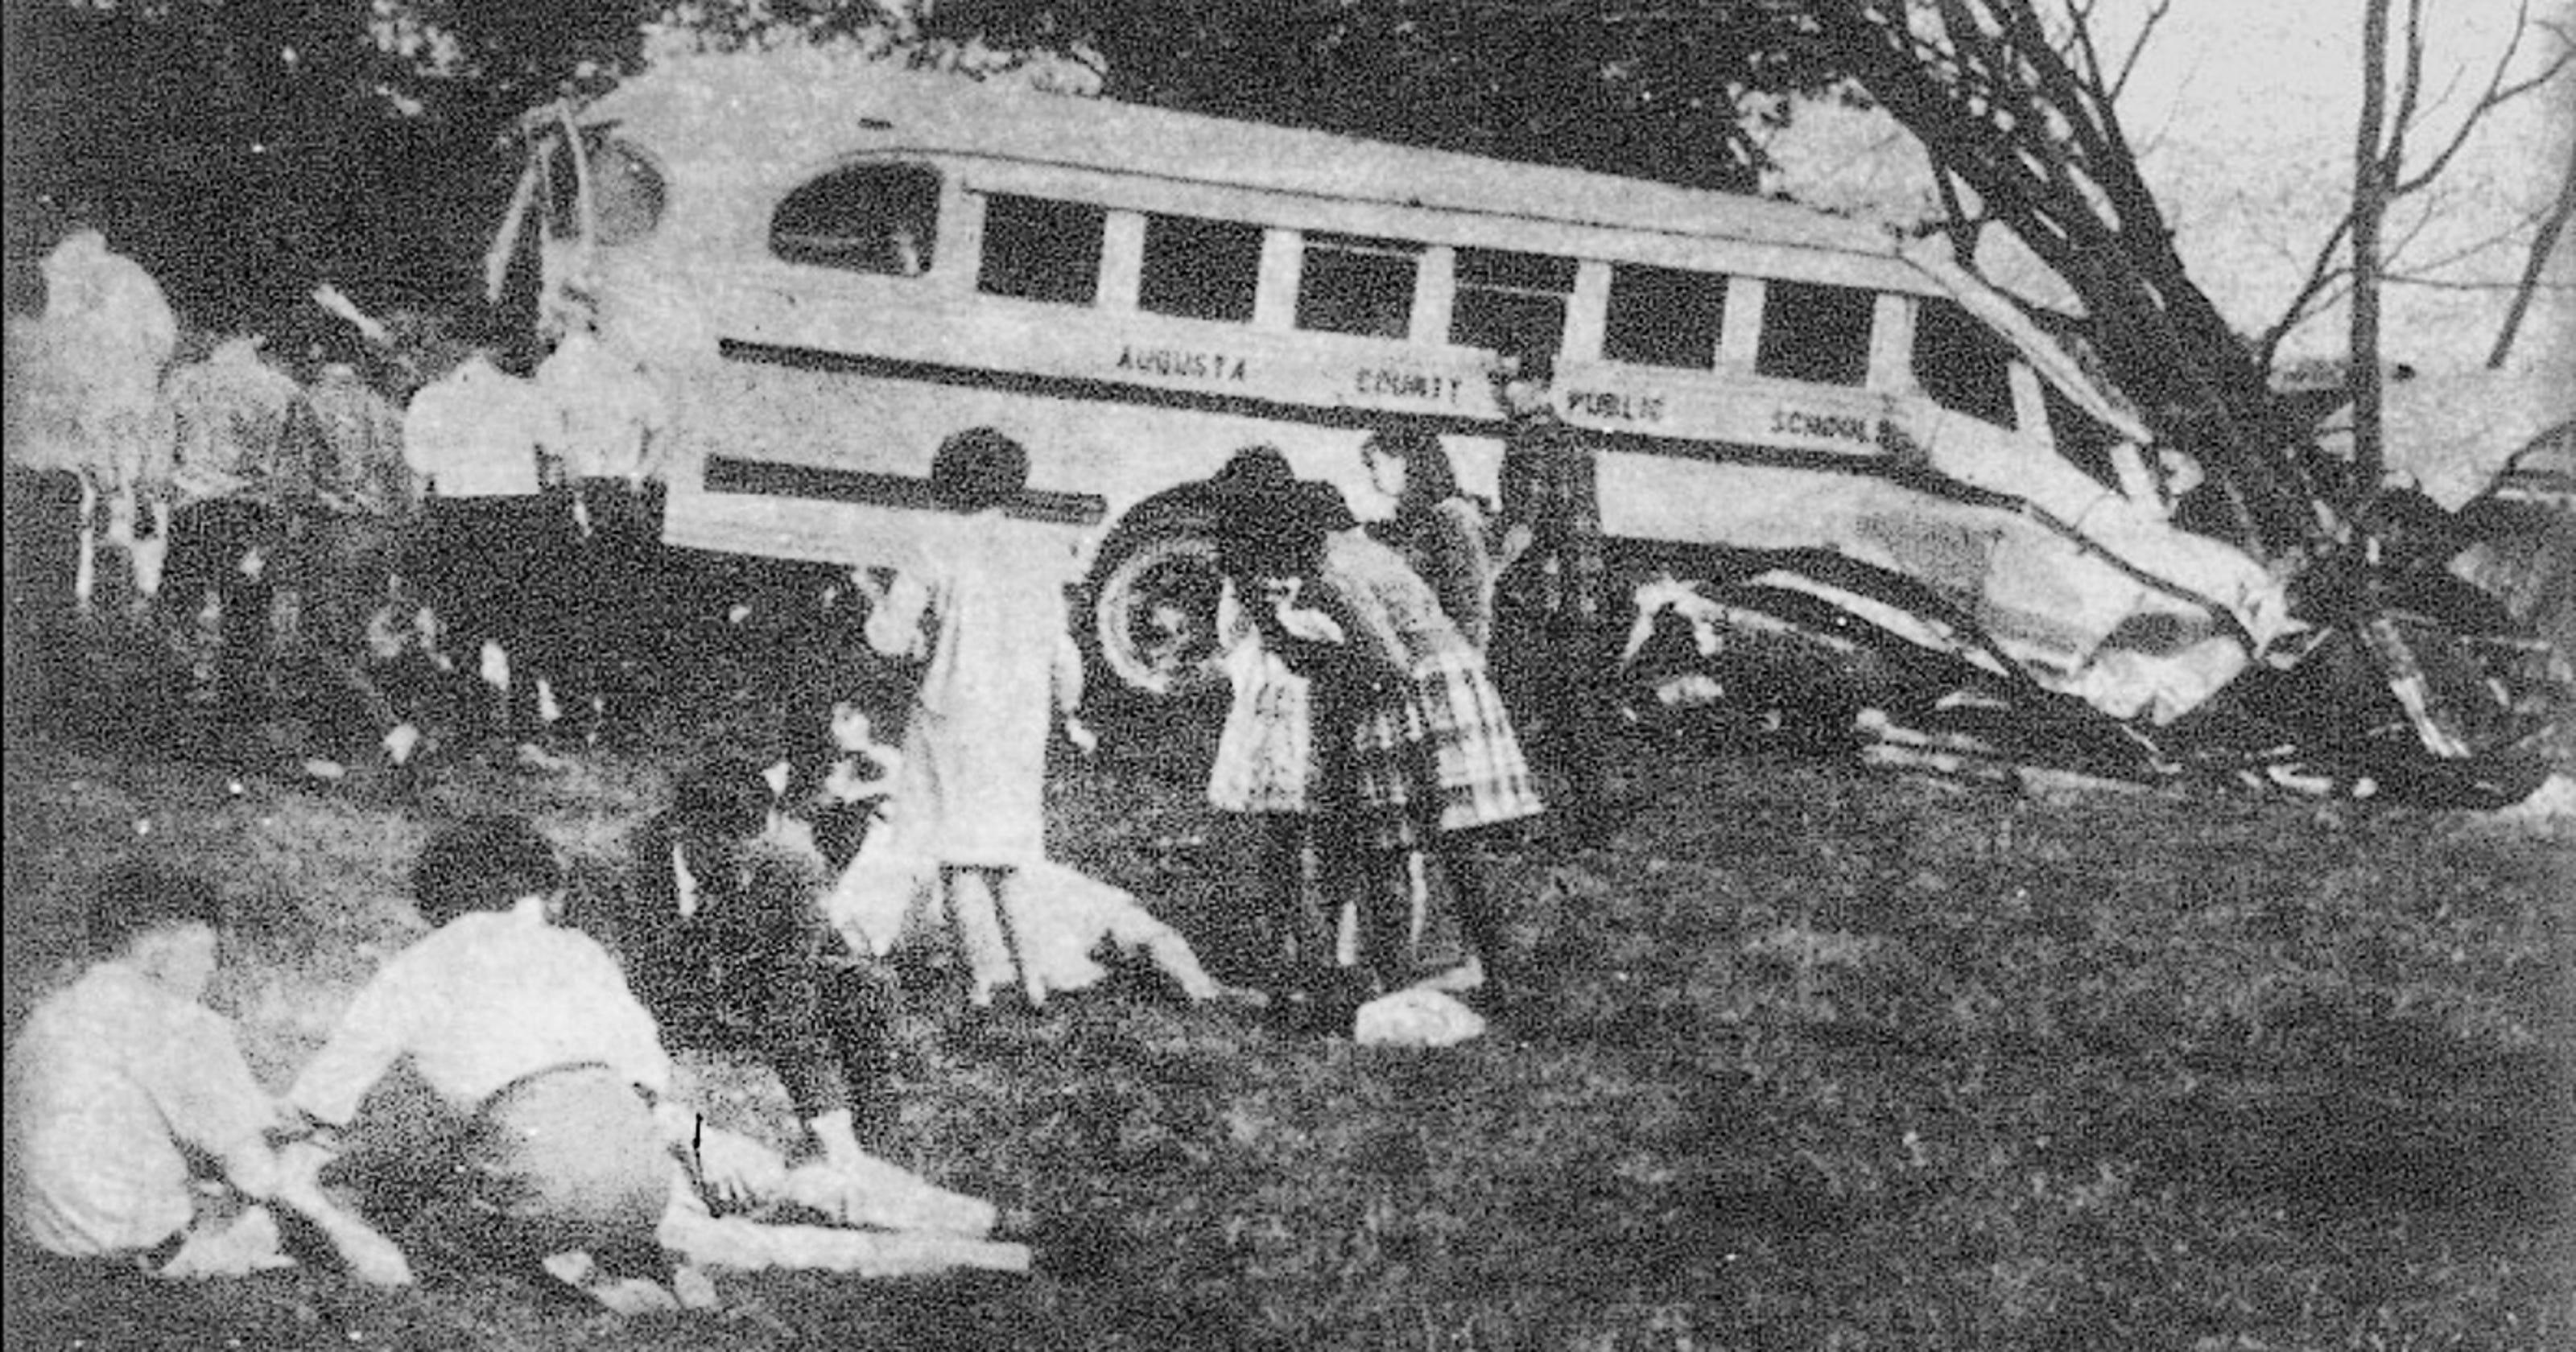 Devastating Fort school bus wreck: 50 years later